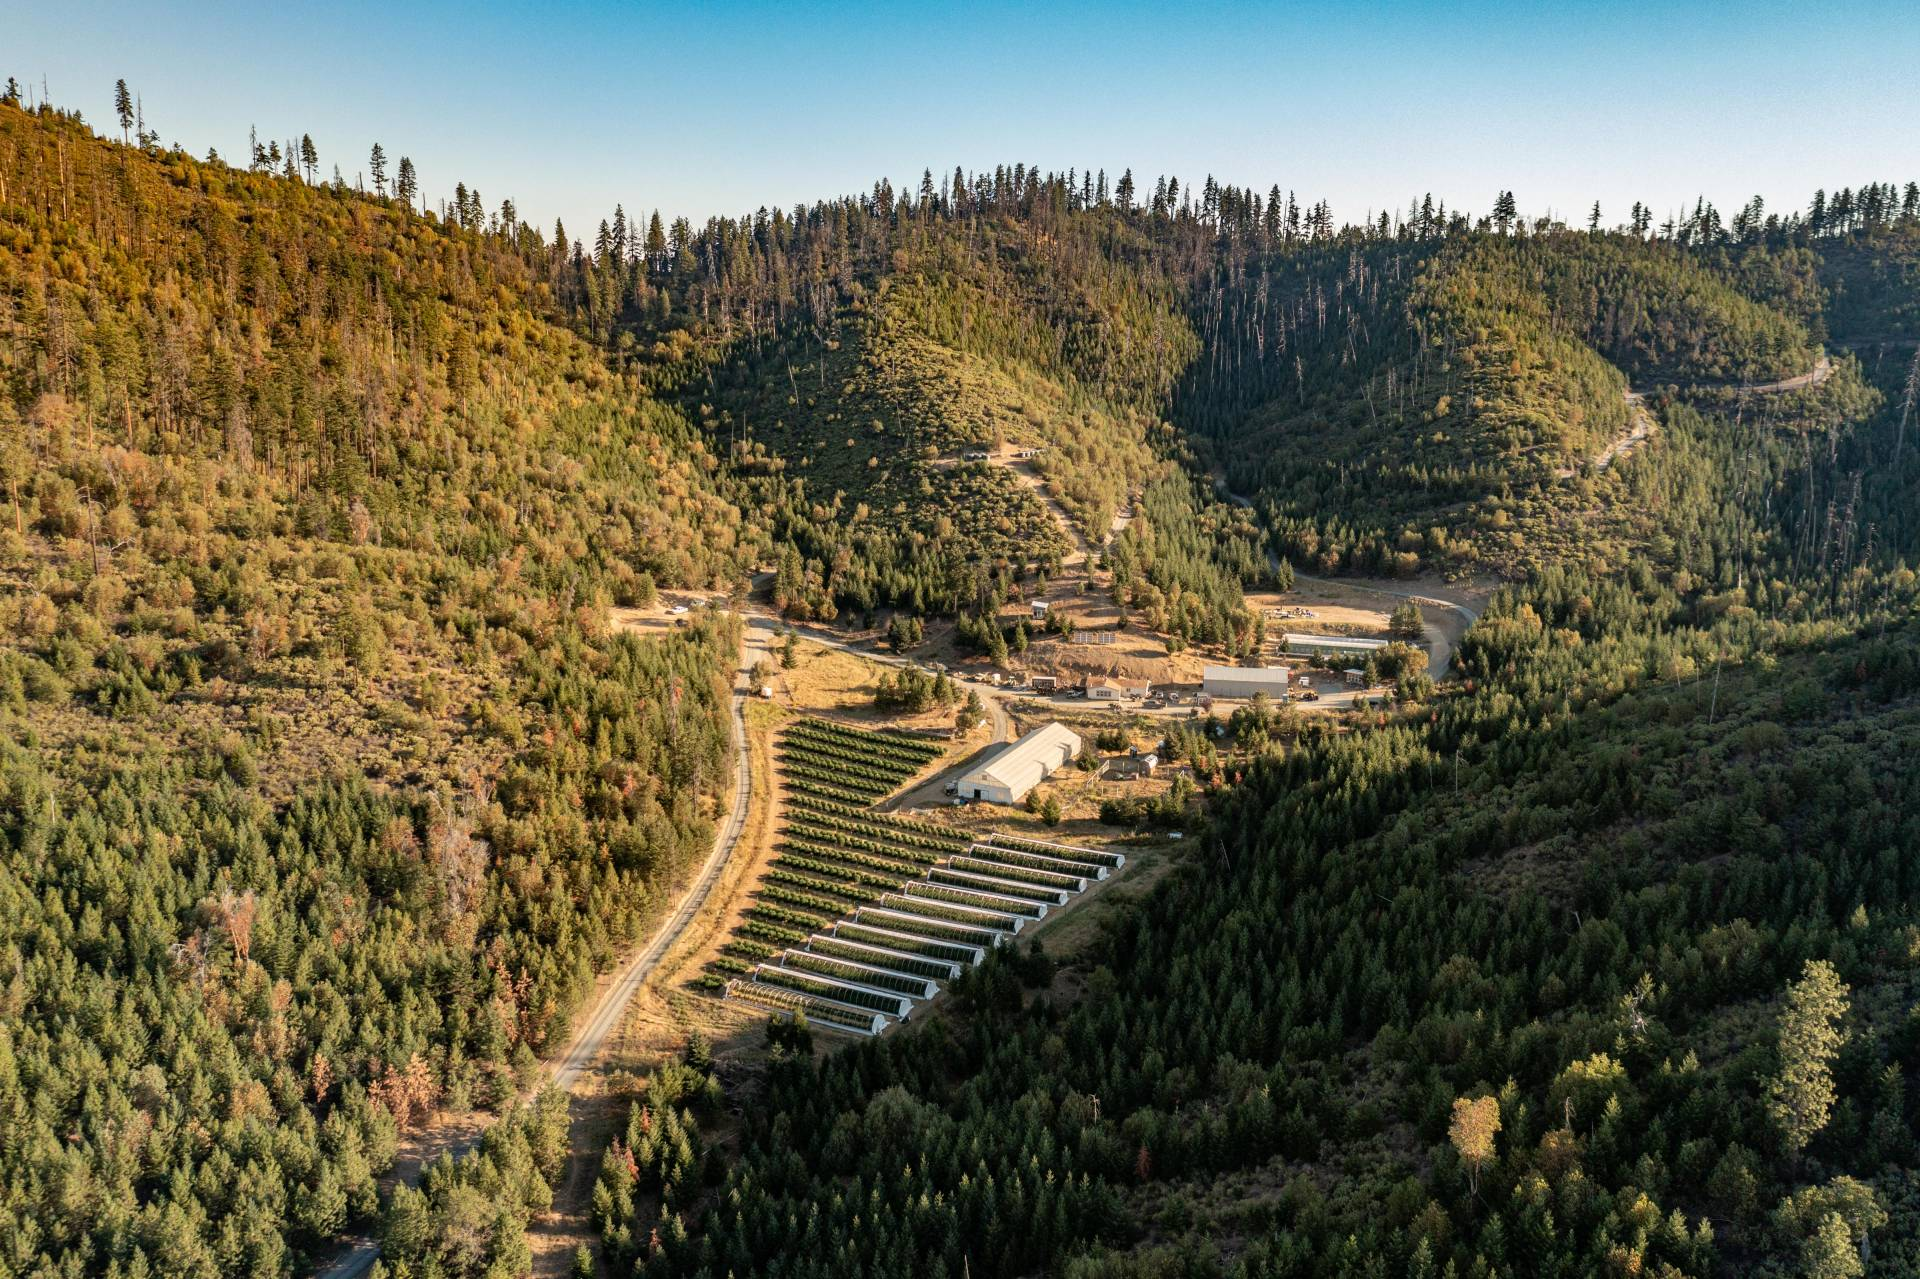 Woodrat Mountain Farms